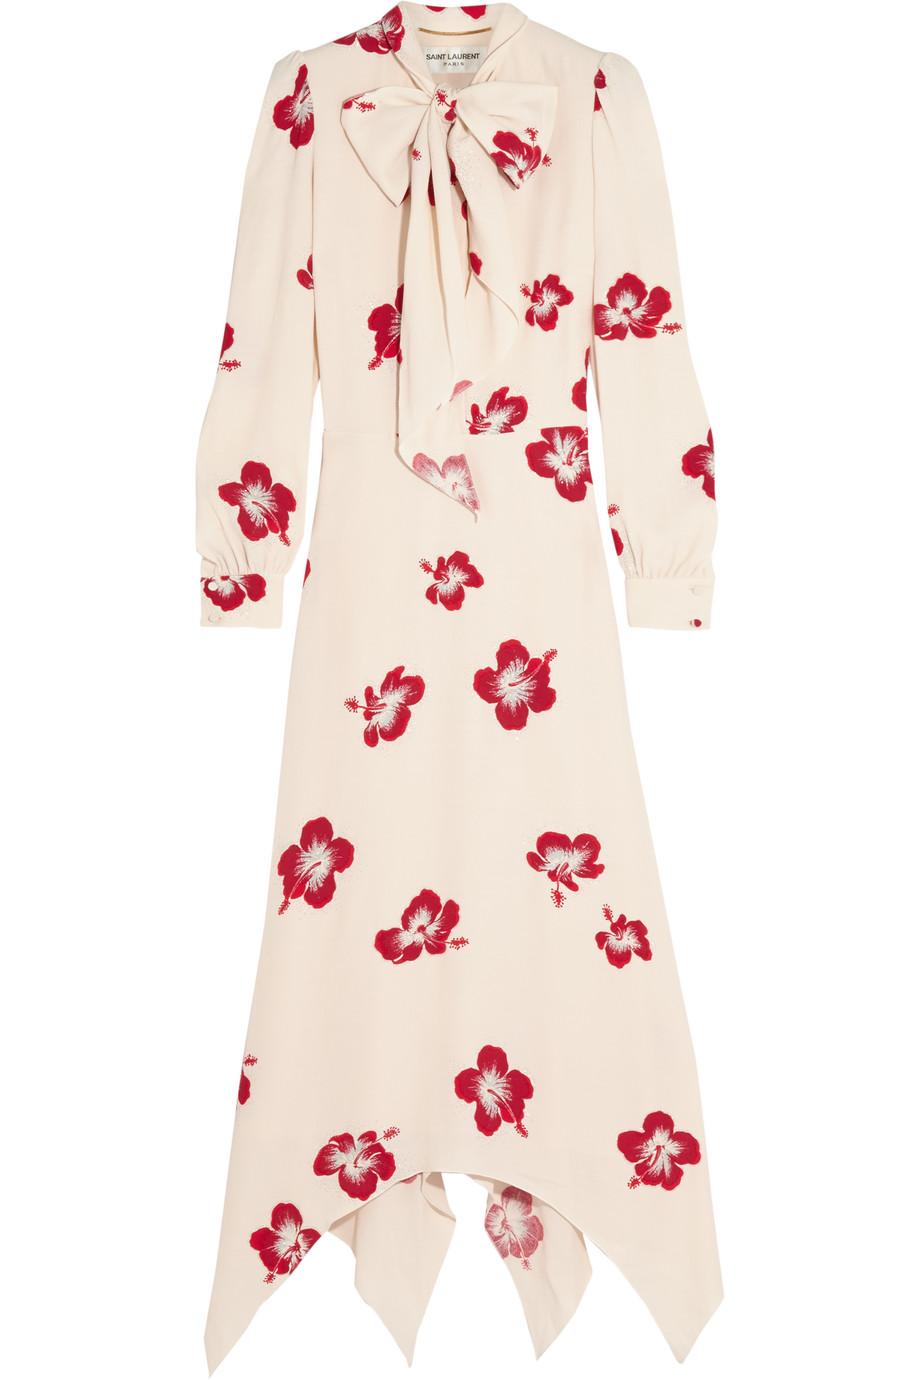 Saint Laurent Pussy-Bow Glittered Floral-Print Crepe Dress, Cream, Women's - Floral, Size: 34